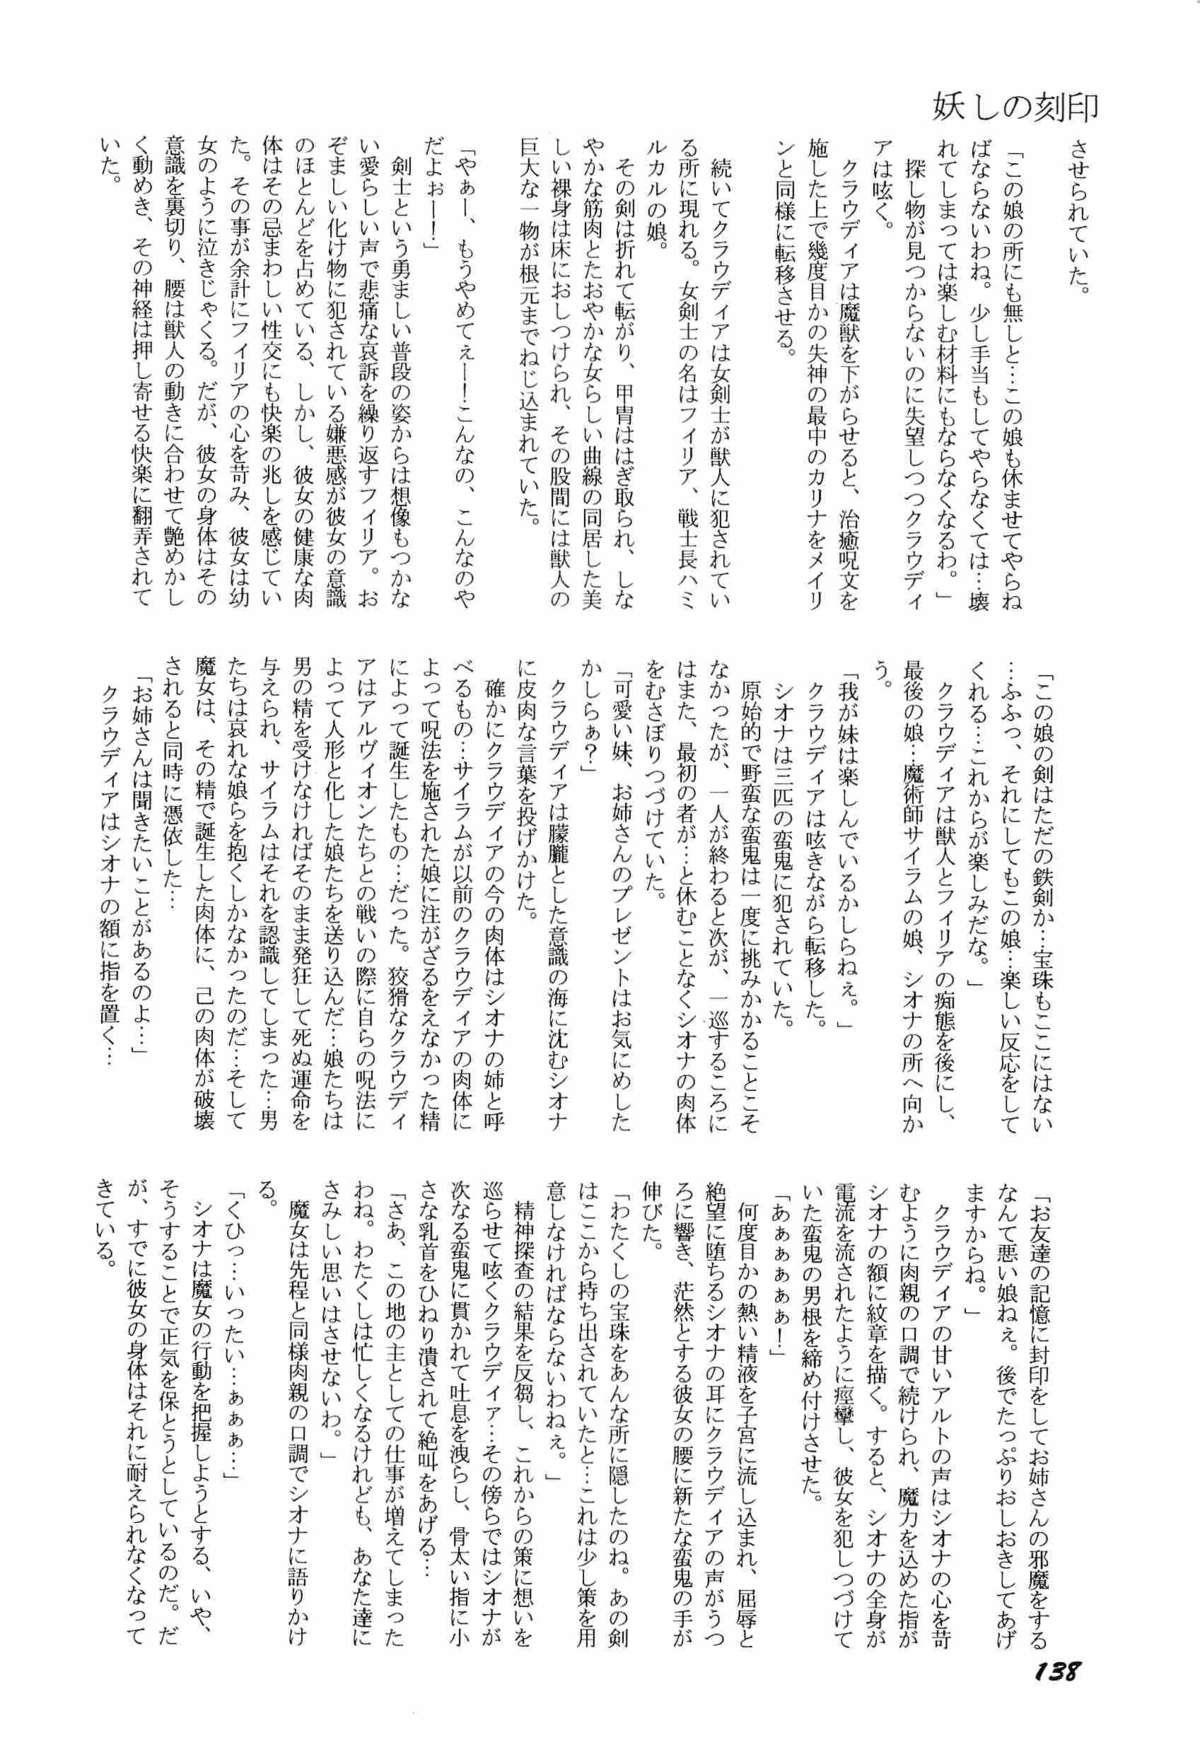 Bisyoujo Anthology '93 jyoukan 140